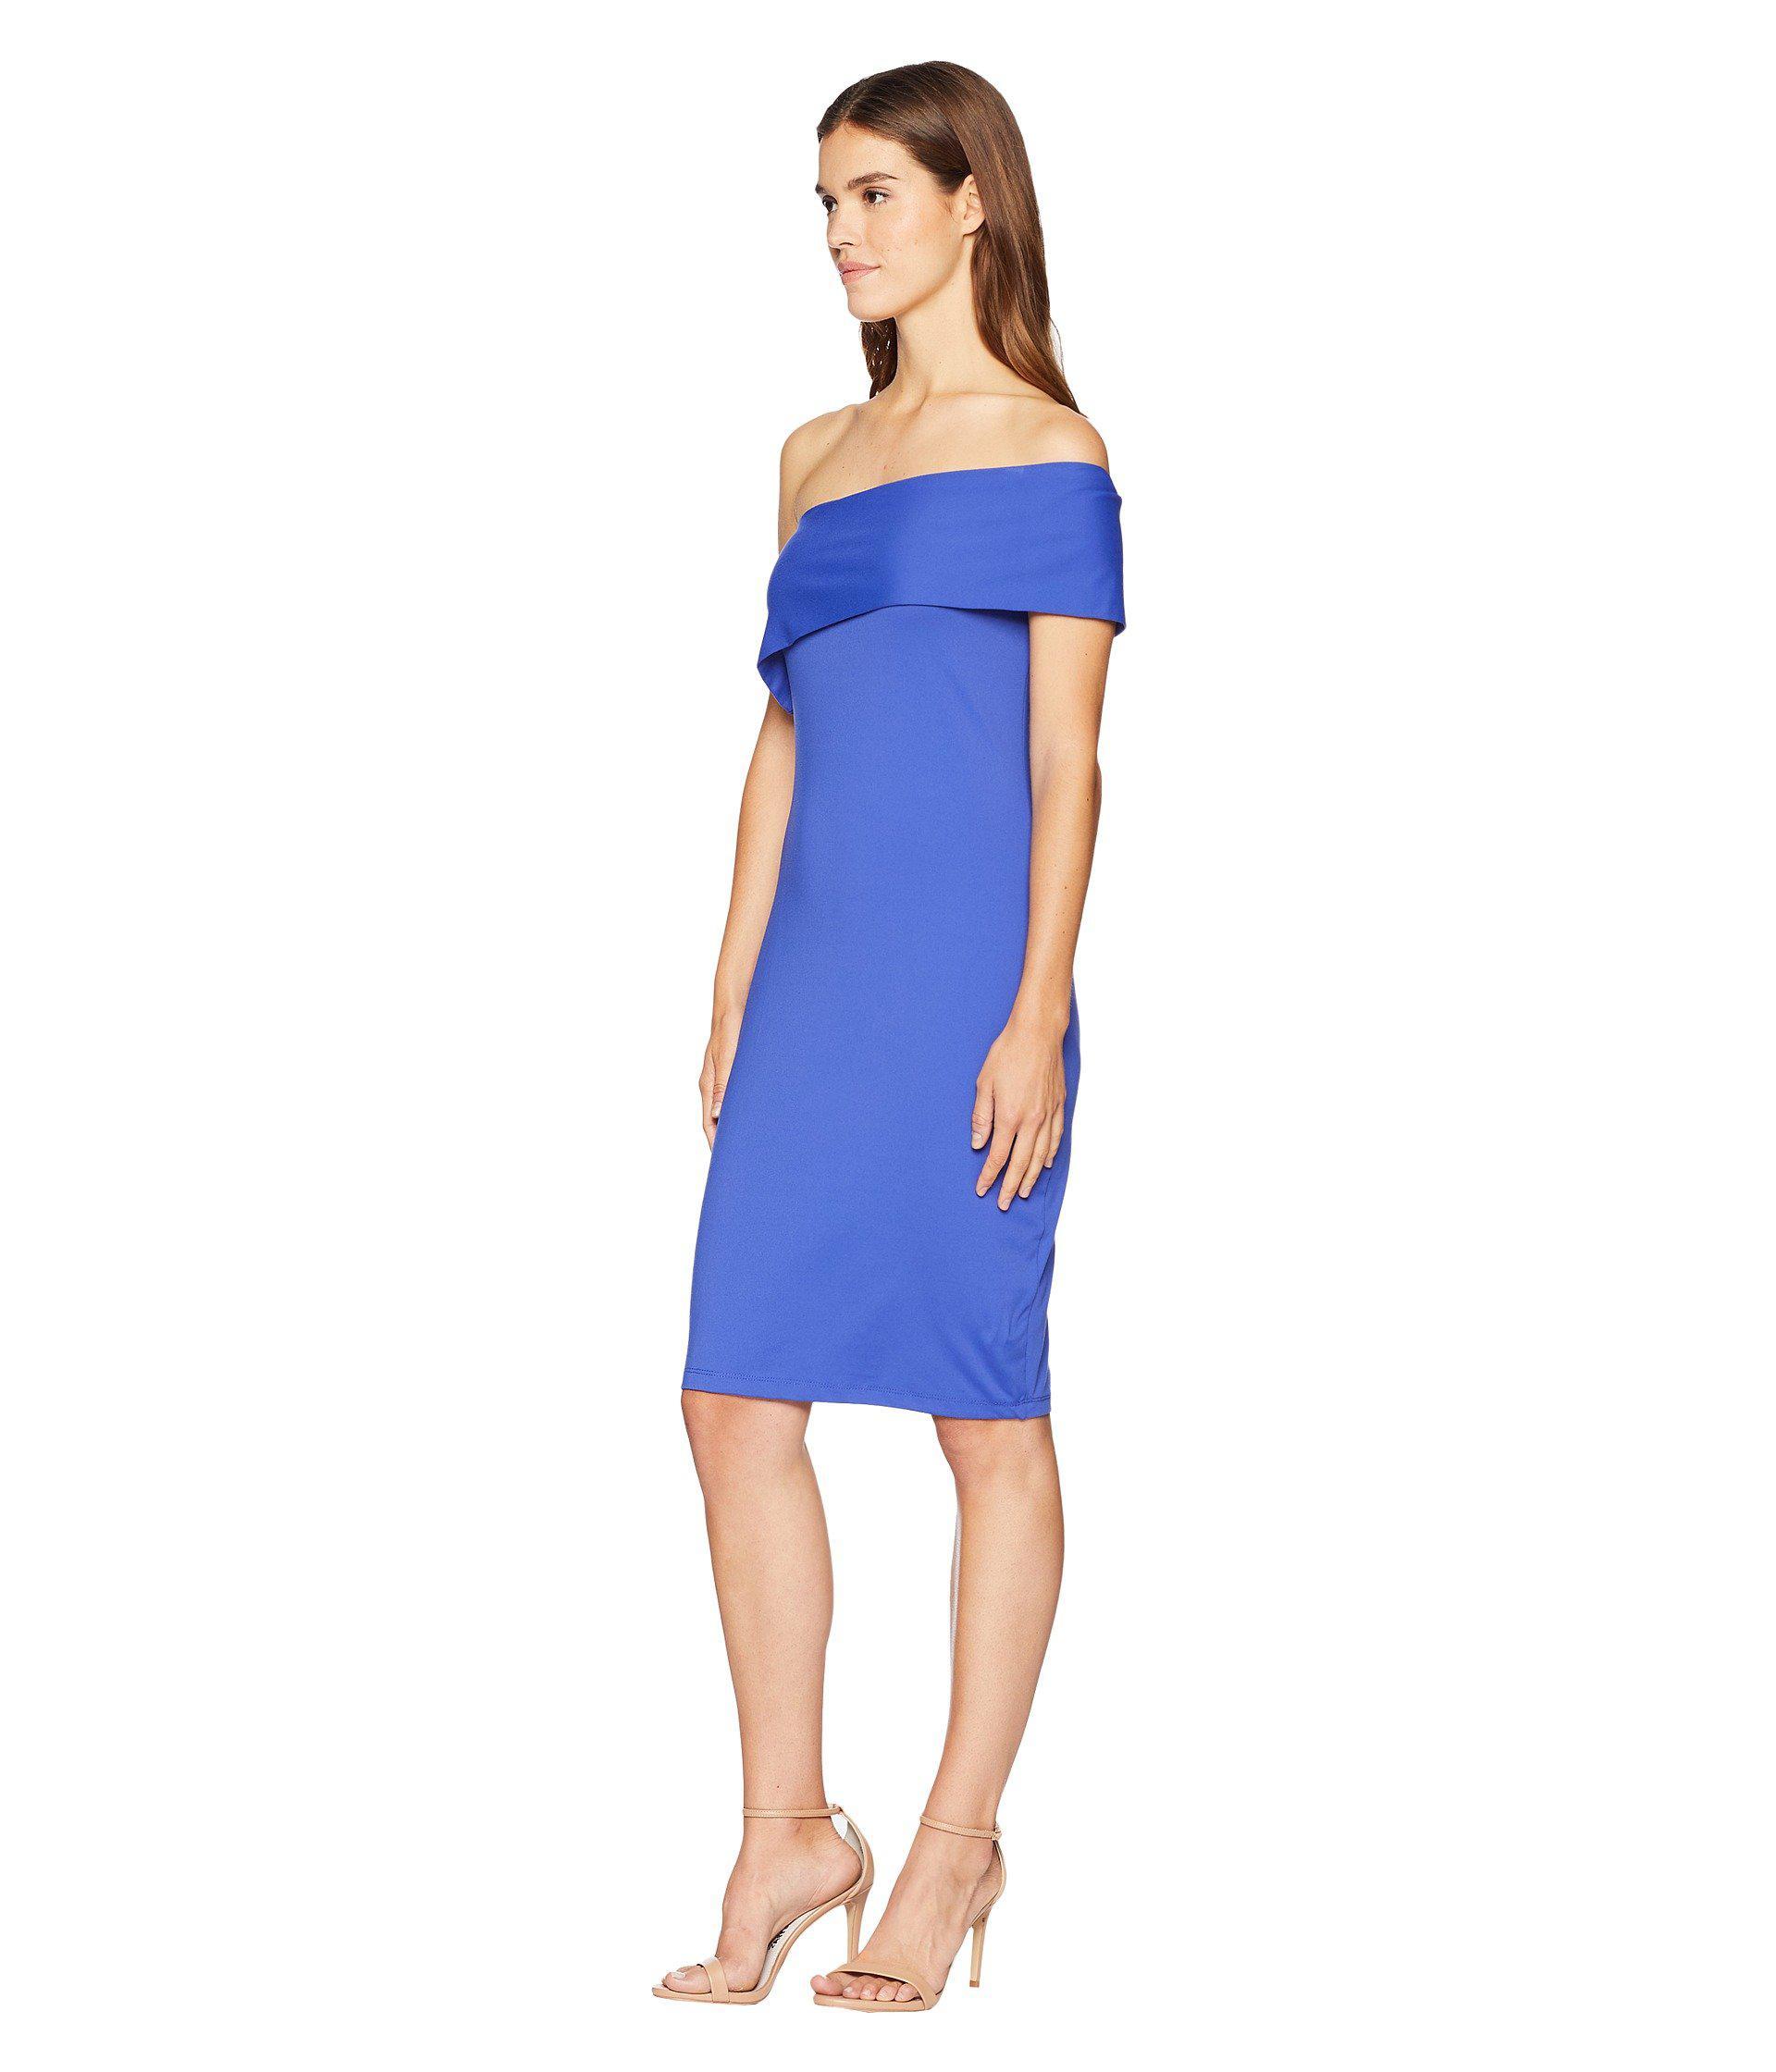 e4065b7a10970 Lyst - Susana Monaco Adriana One Shoulder Fold-over Dress in Blue - Save 30%